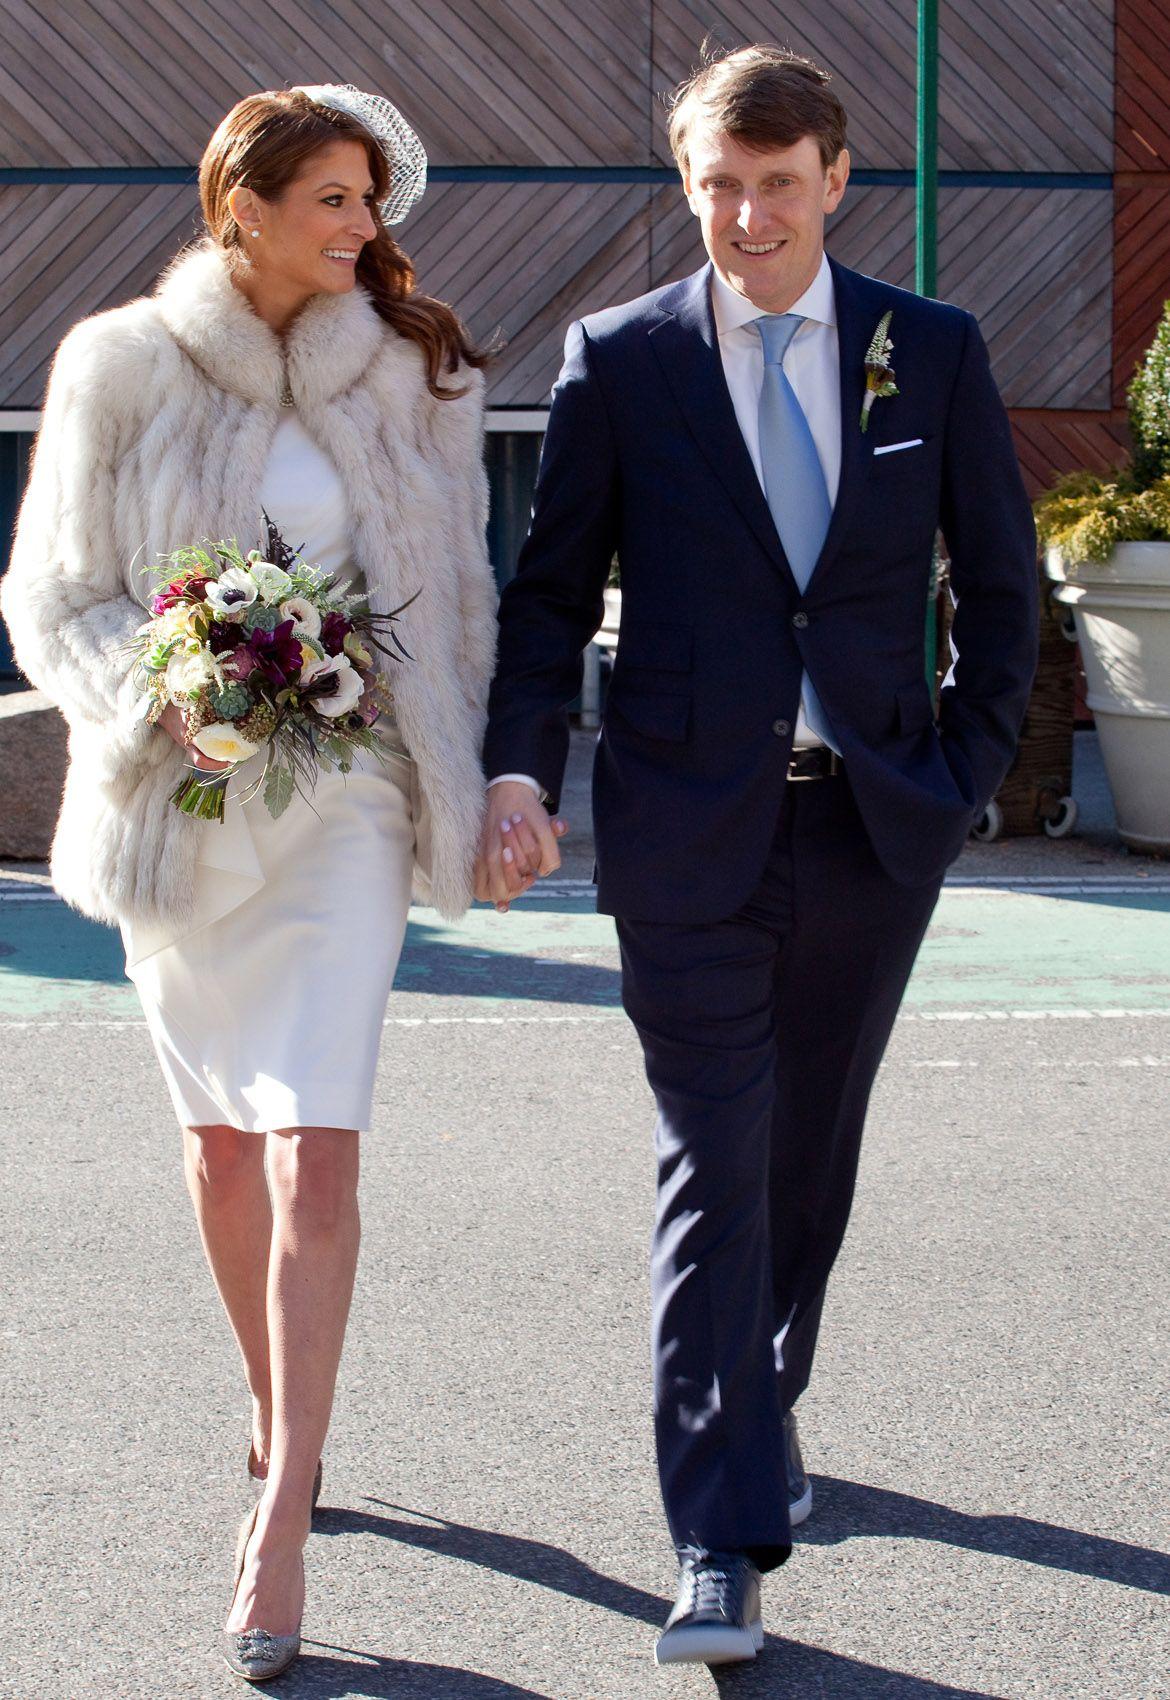 ChristopherWhite_Jordan_wedding_8.jpg